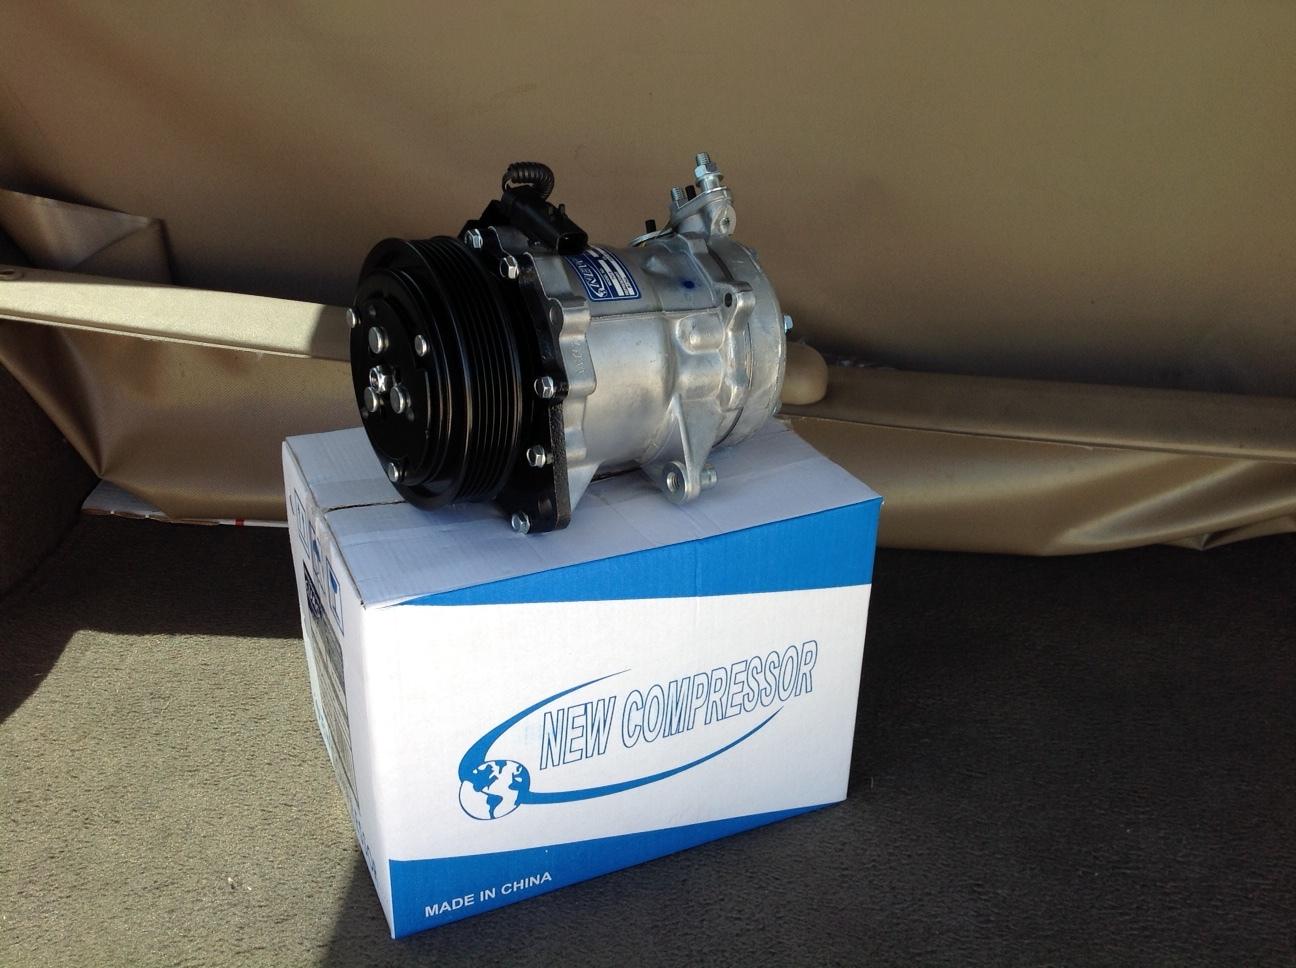 02-05 Jeep Liberty 3.7 Auto AC Air Conditioning Compressor Repair Part Kit